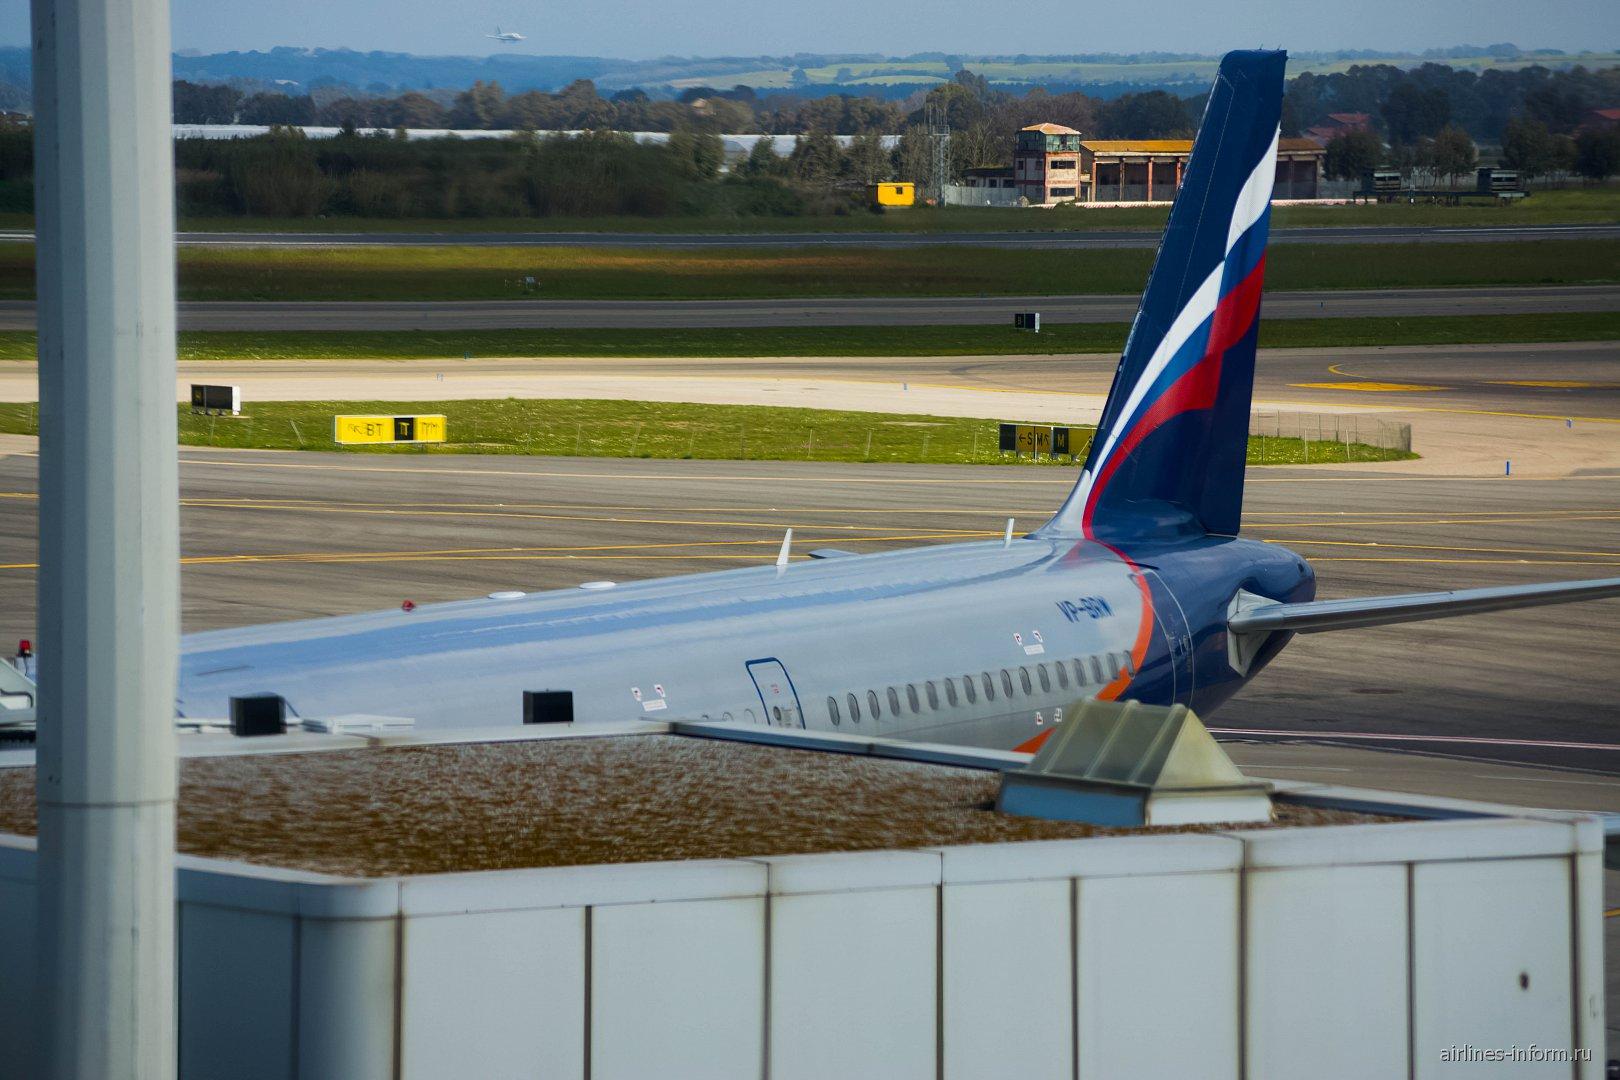 Rome - Moscow SU2403 Aeroflot